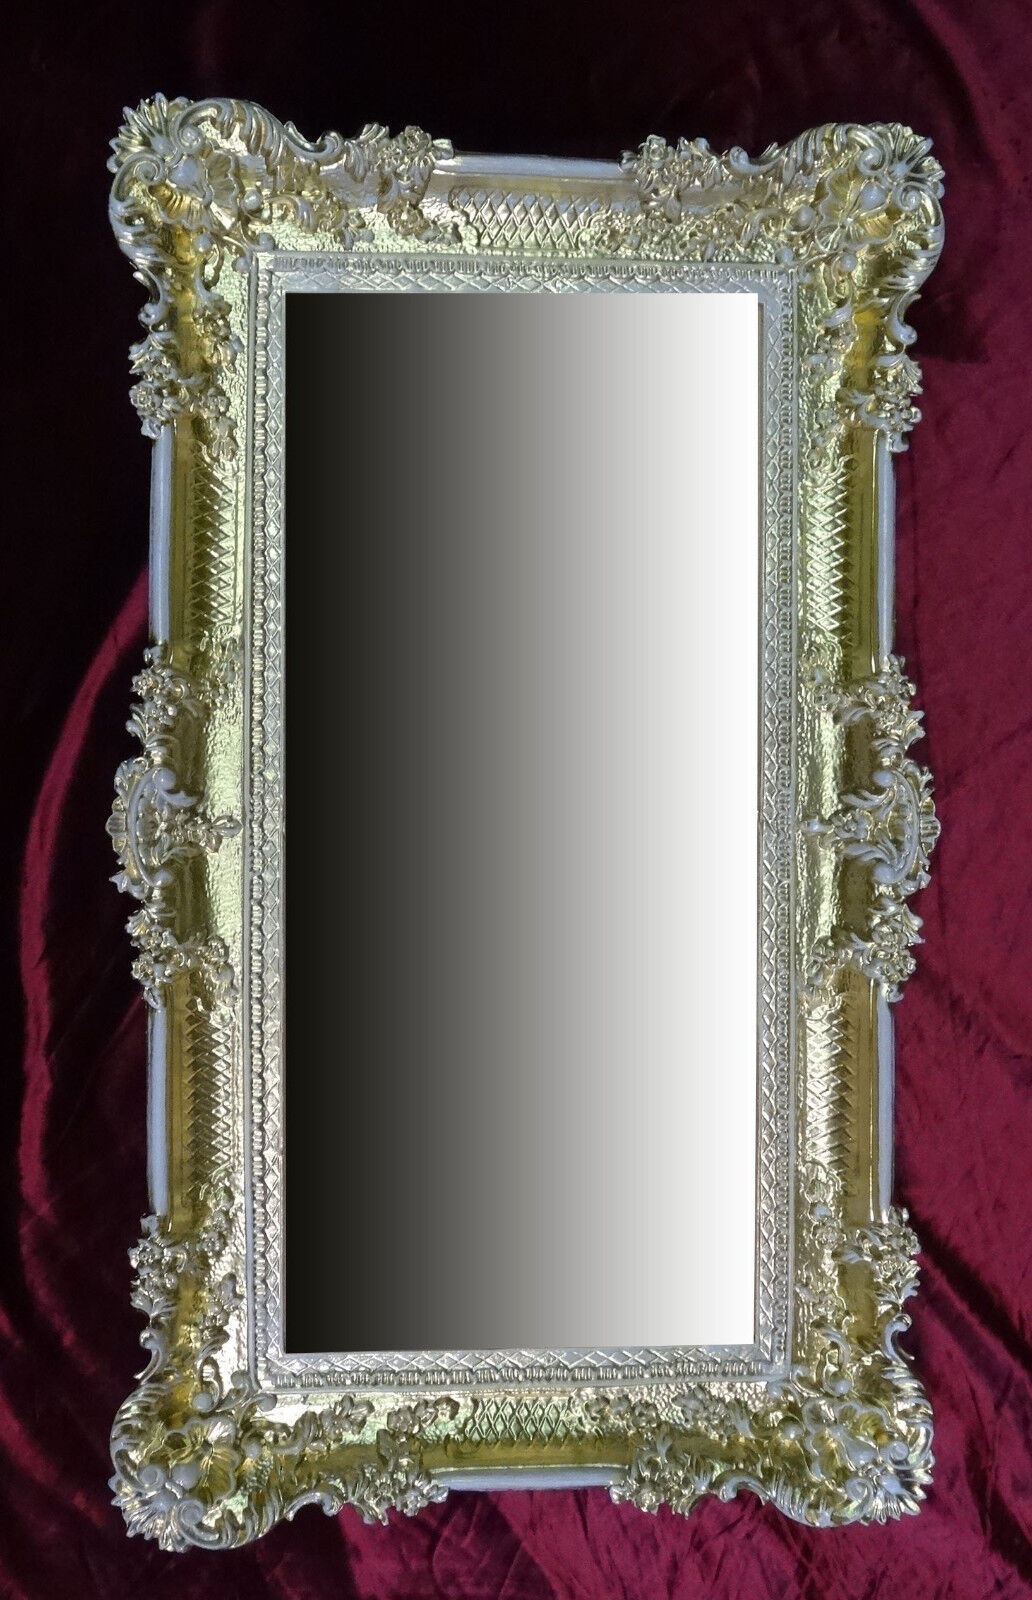 Grand baroque miroir mural ancien ornementations en or blanc 96x57 ebay for Grand miroir blanc baroque